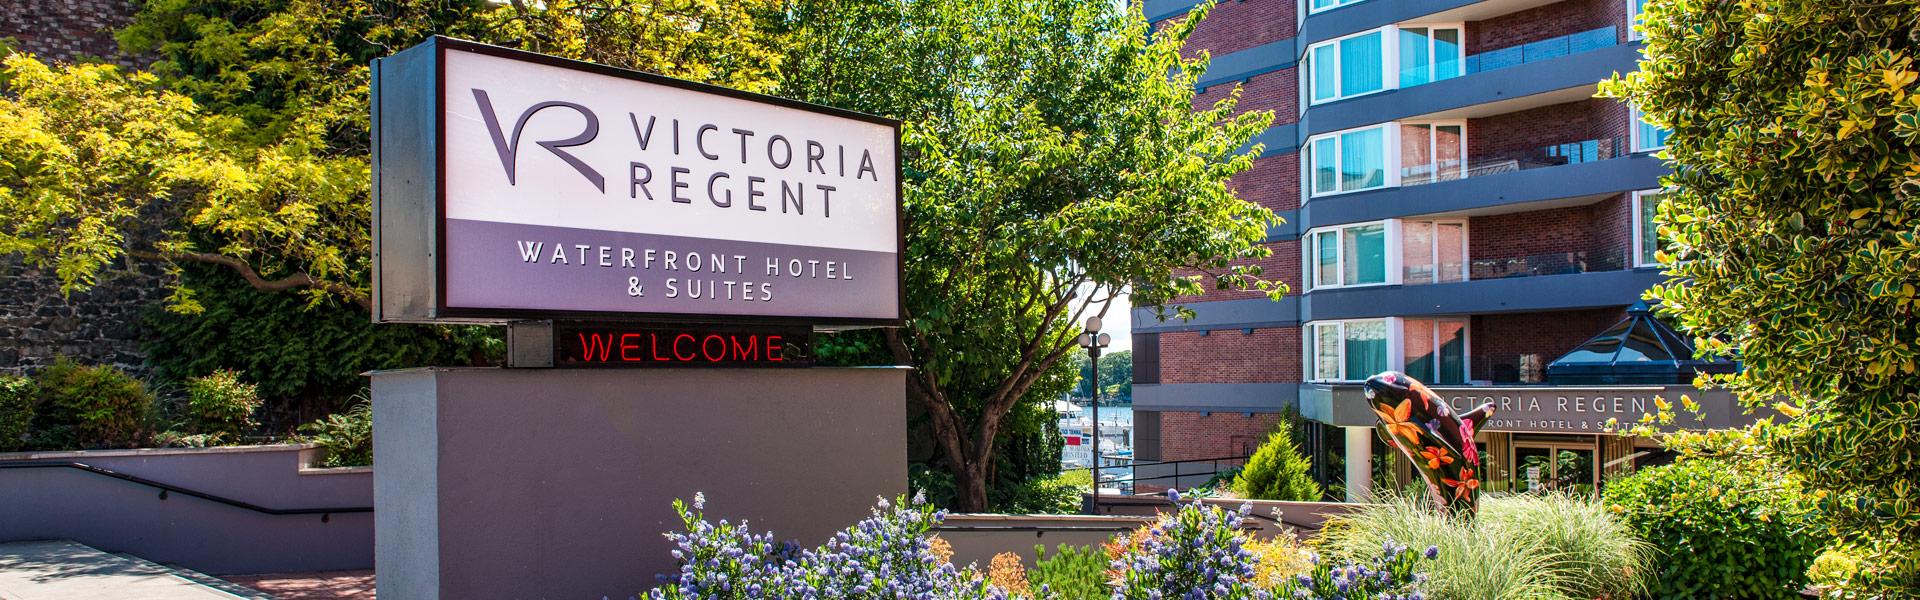 Victoria Regent Hotel Entrance